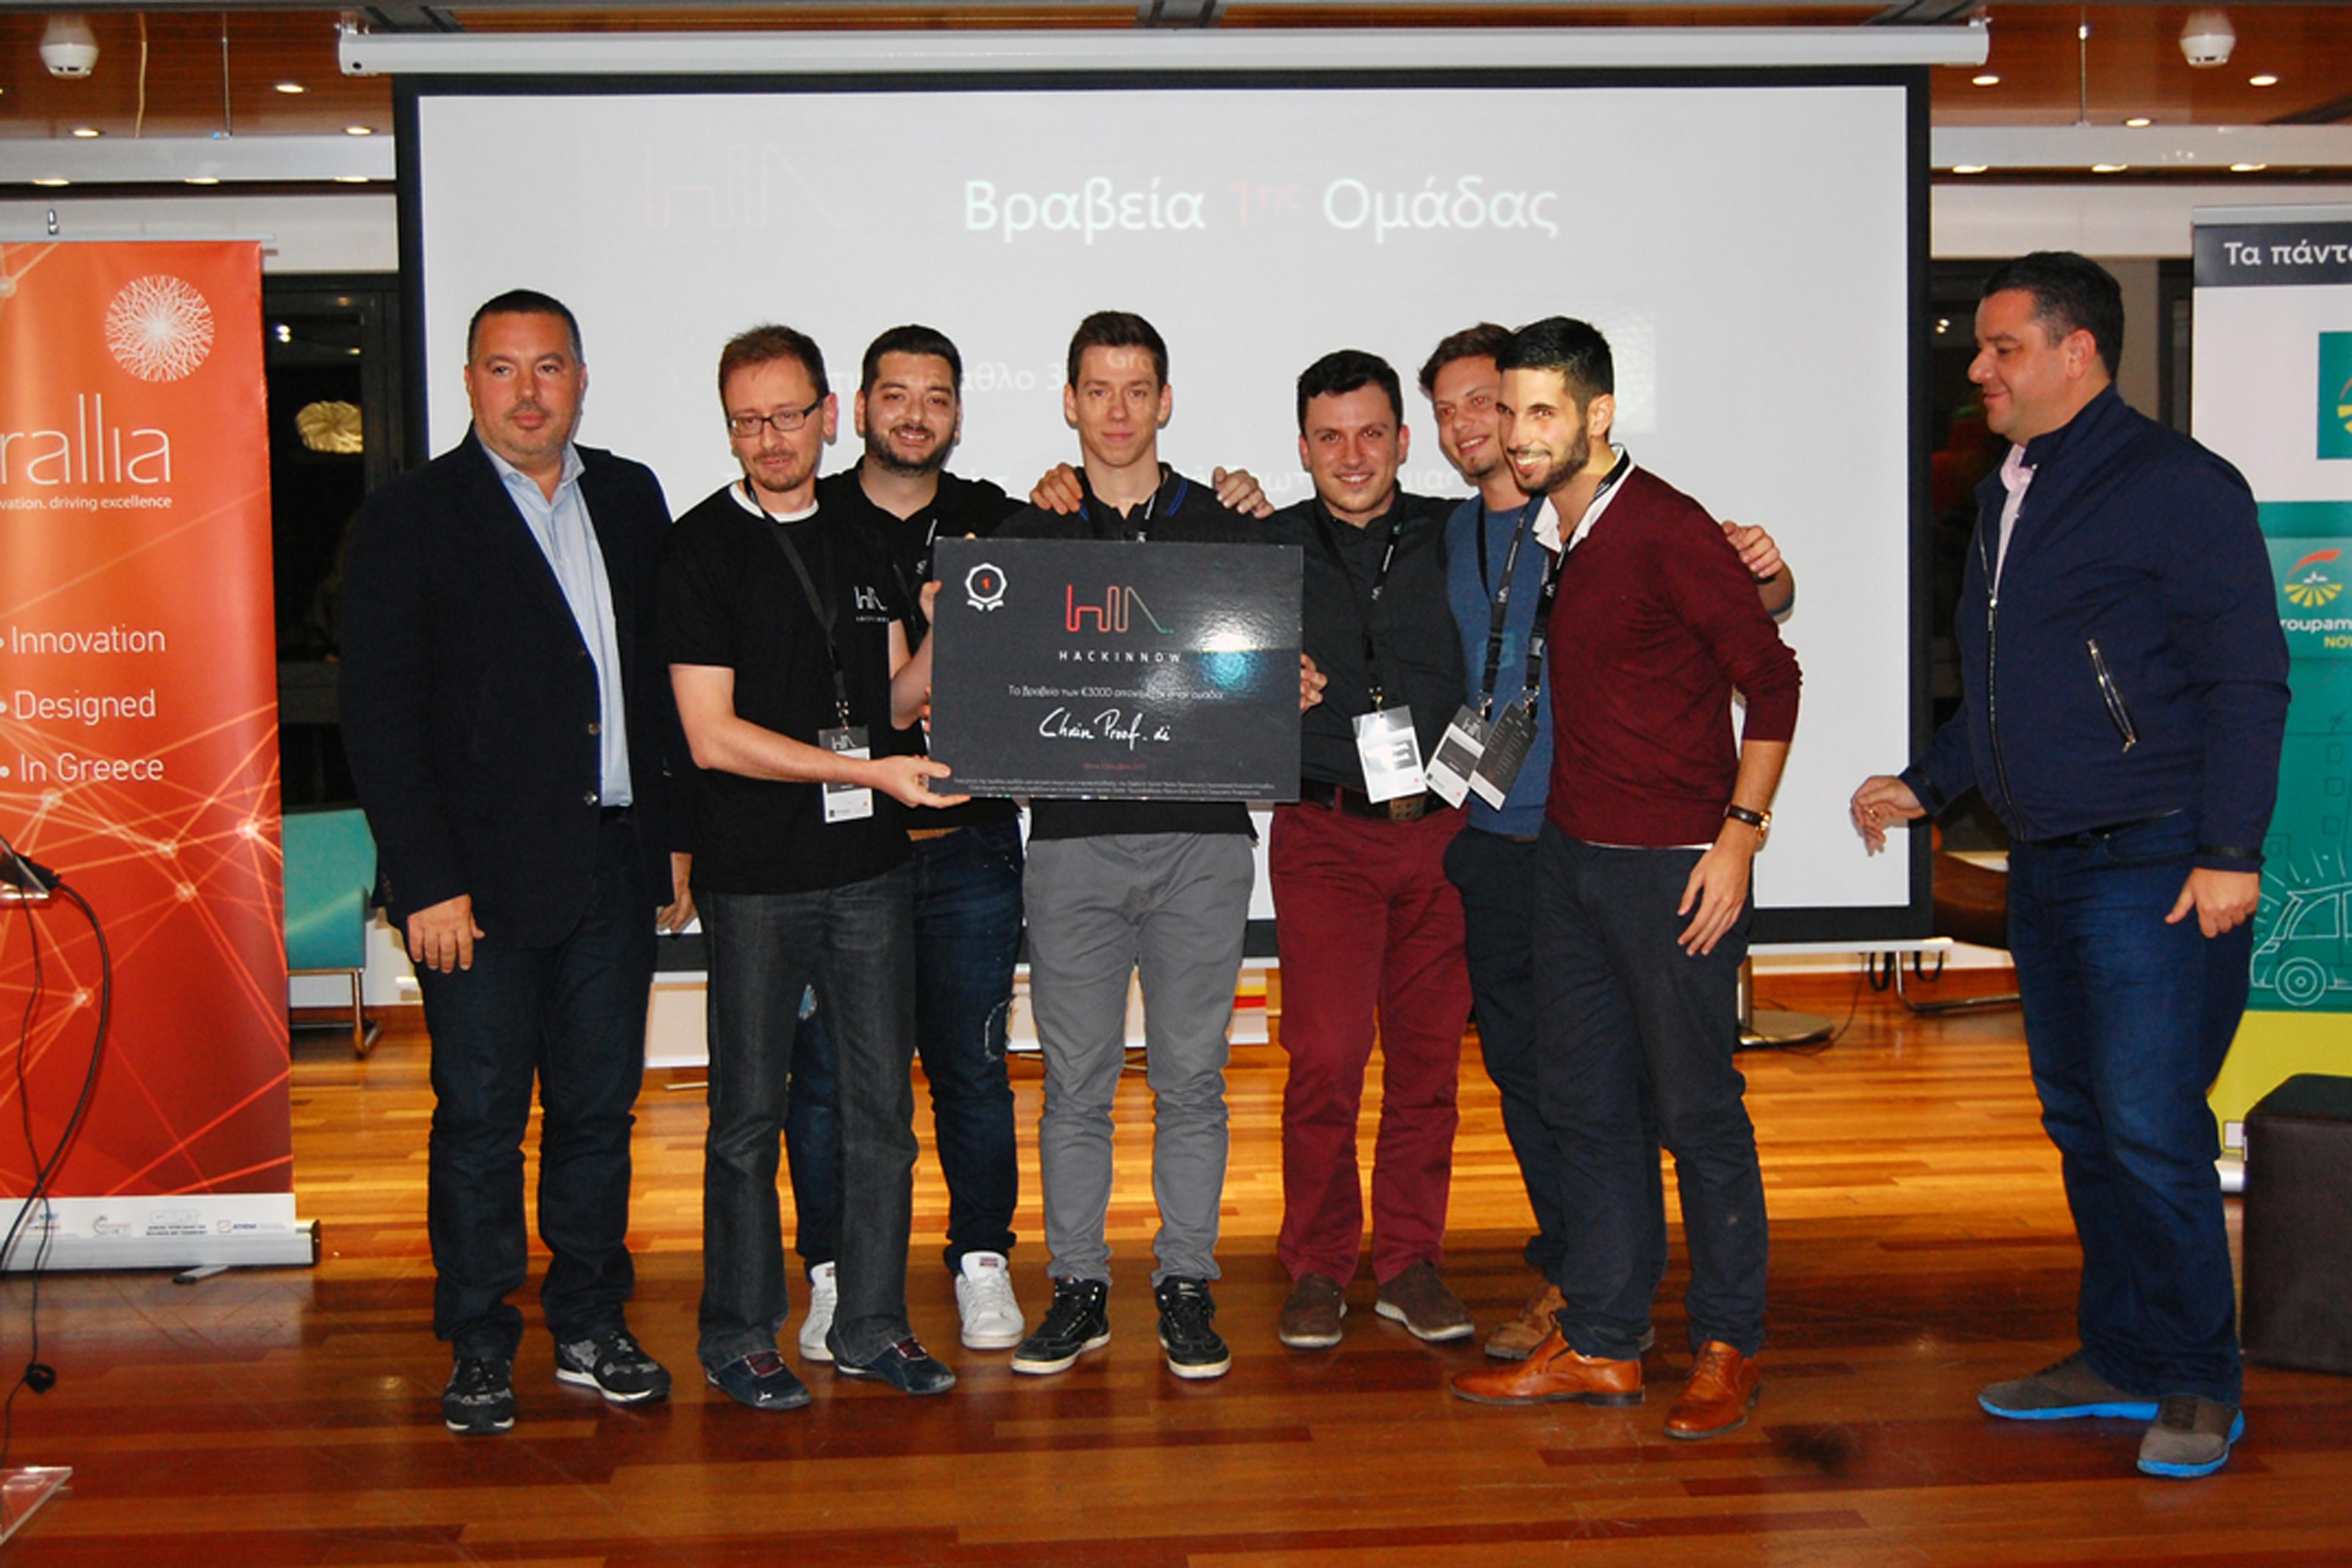 WE MAG - HackInnow-2017-by-Corallia-and-Groupama